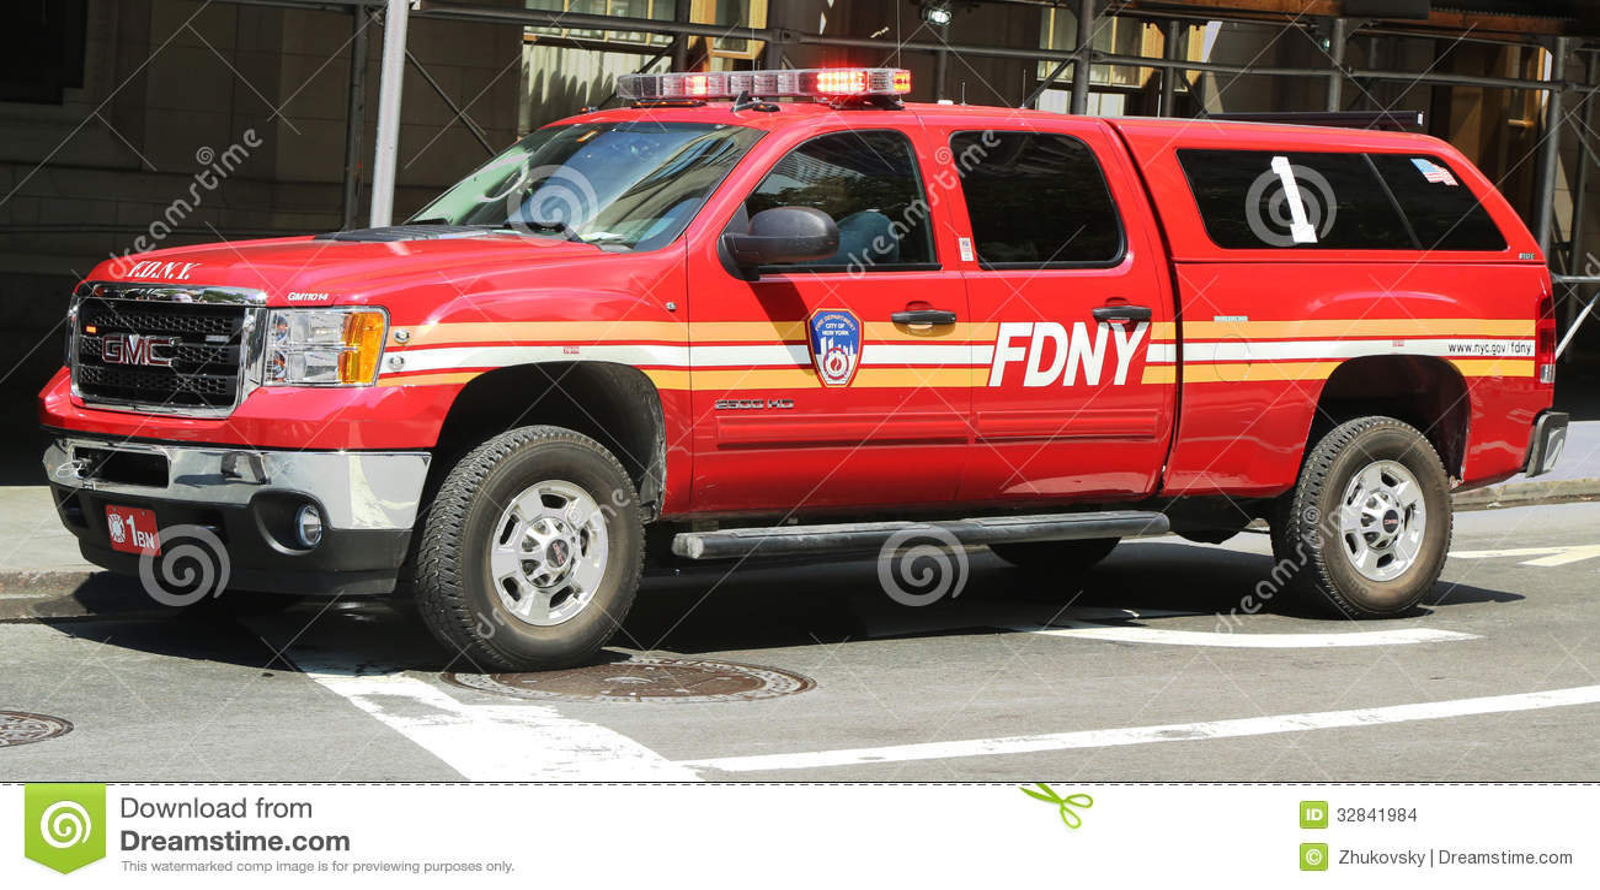 Fdny Battalion 1 Chief Suv In Lower Manhattan Editorial